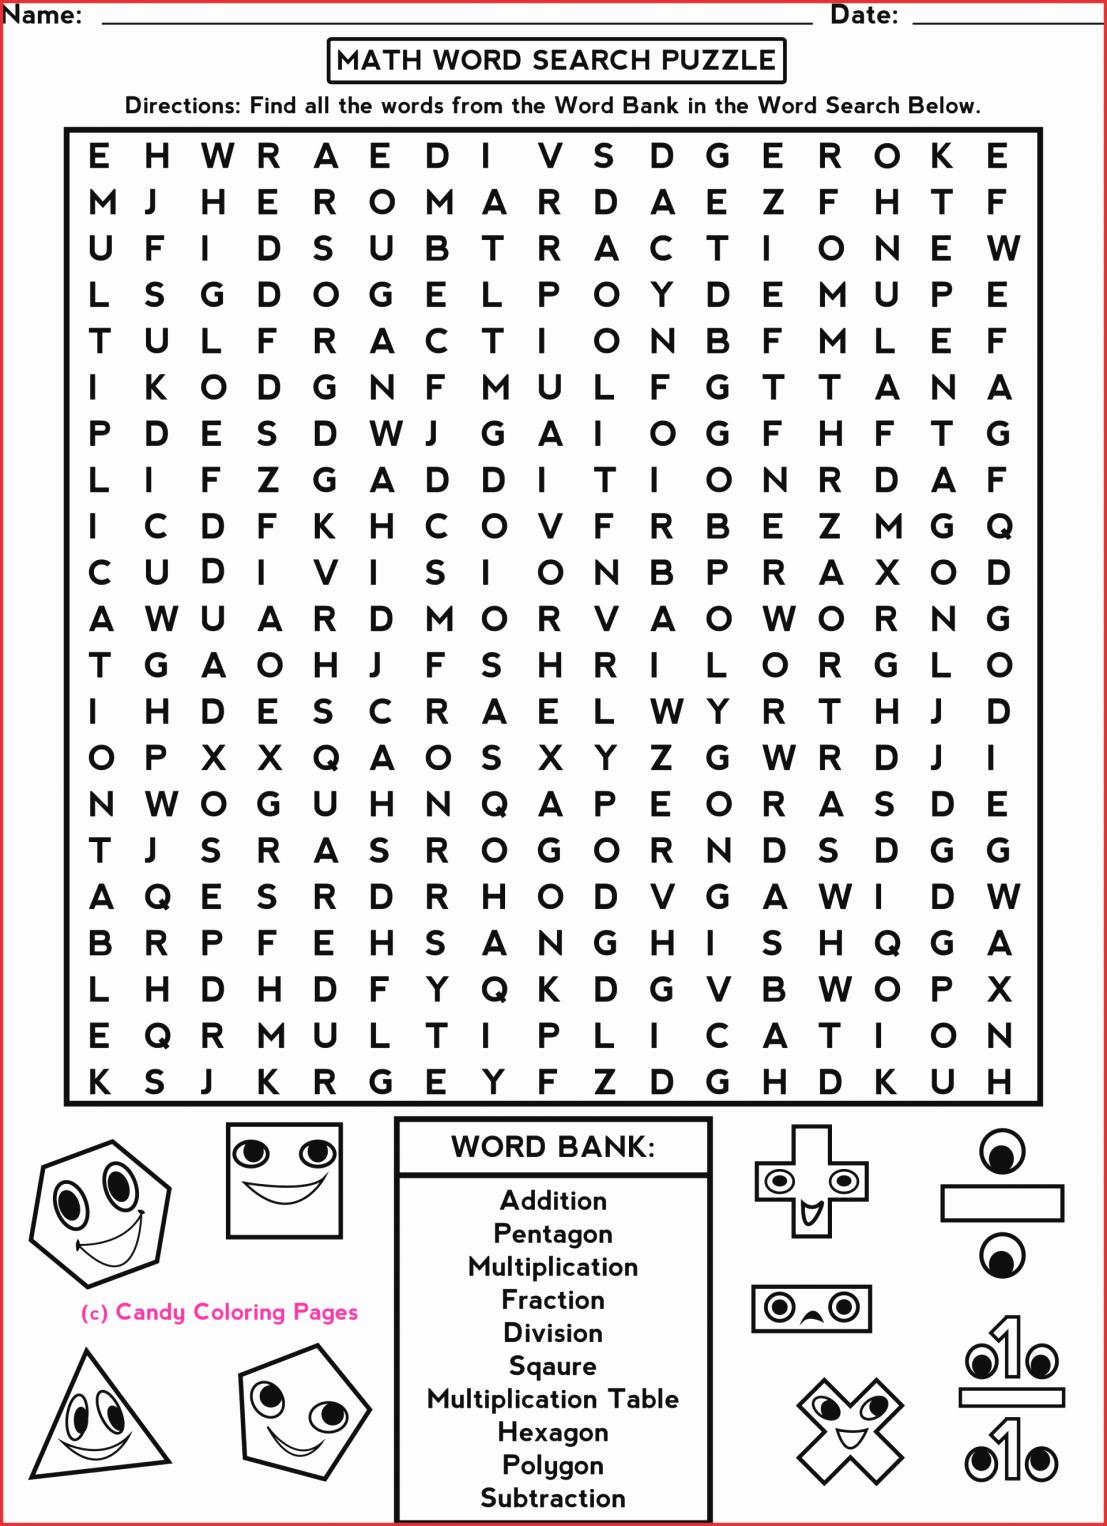 7Th Grade Crossword Puzzles Fresh 7Th Grade Math Word Search - Printable Crossword Puzzles 3Rd Grade